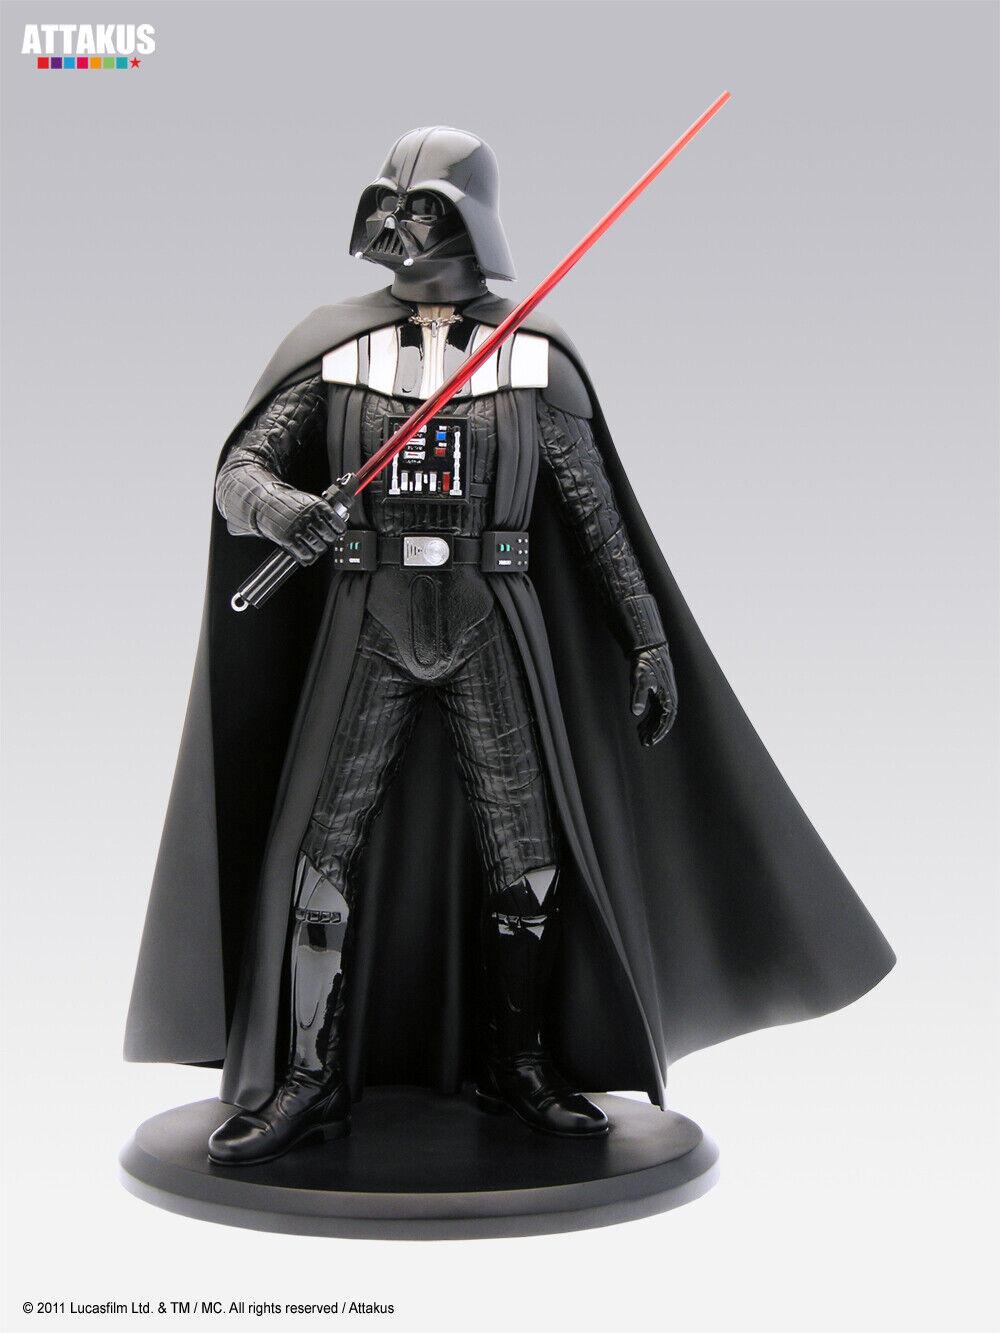 Attakus Statue Darth Vader Dark Vador Star Wars 40 cm 1500 exemplaires